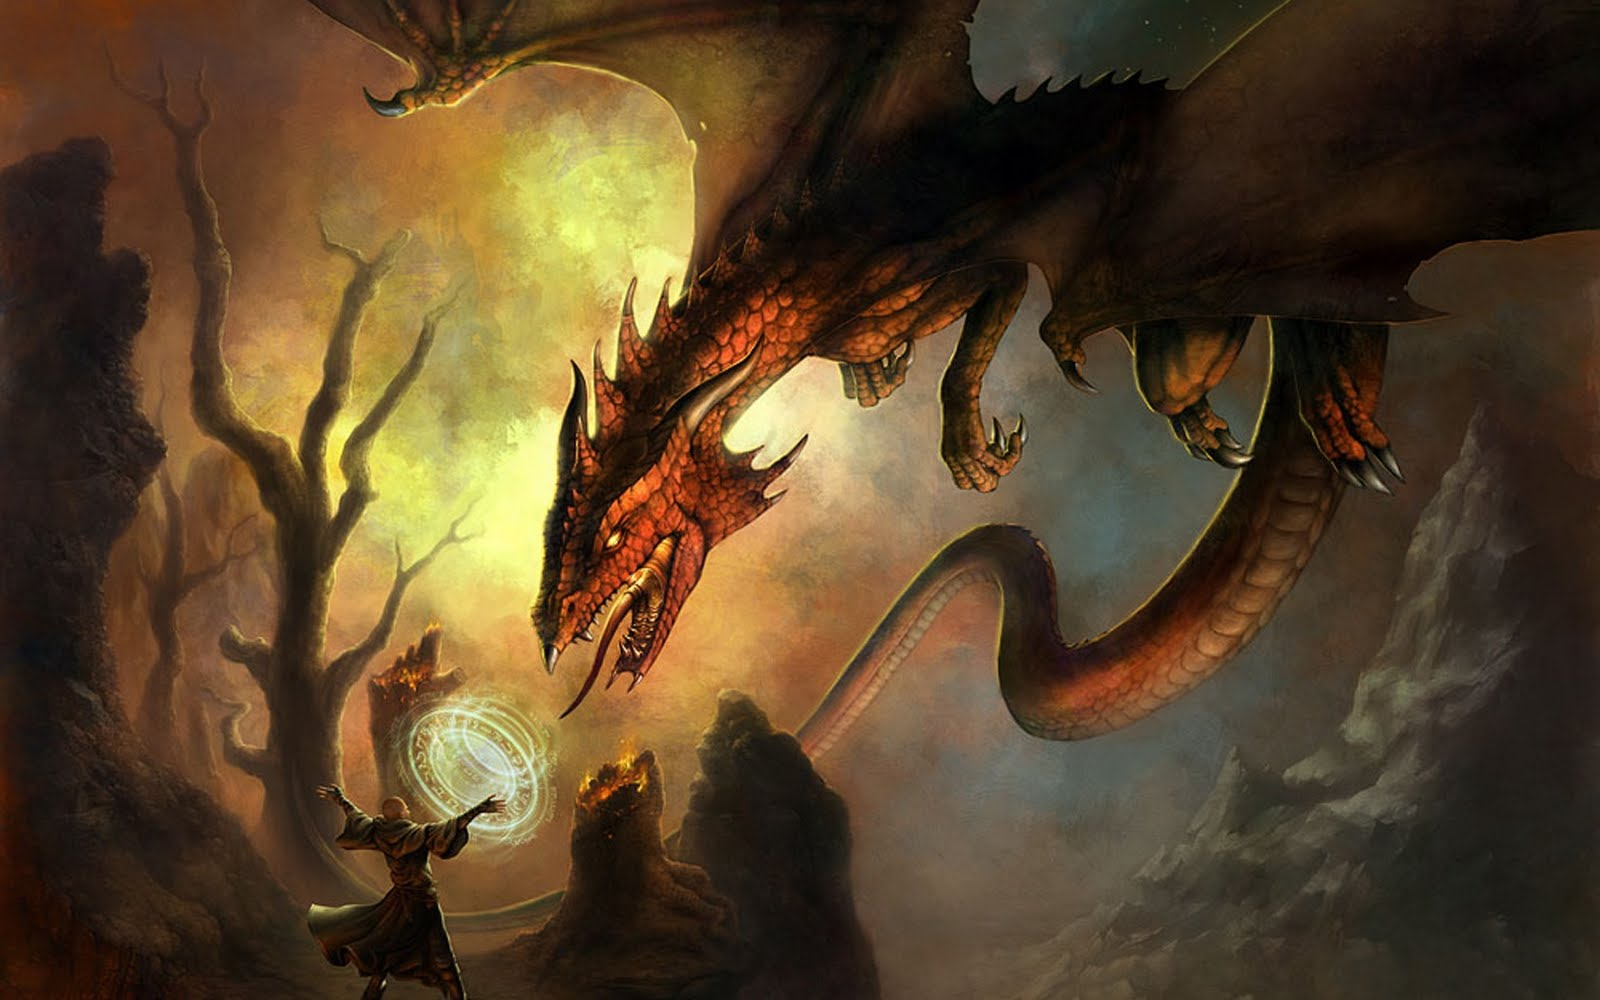 http://2.bp.blogspot.com/-8wzQiTXmY_I/Tj7L6xK_duI/AAAAAAAABCY/kWZLGjifTbw/s1600/mago-wizard-feiticeiro-wallpaper-necromancer--dragon-10.jpg